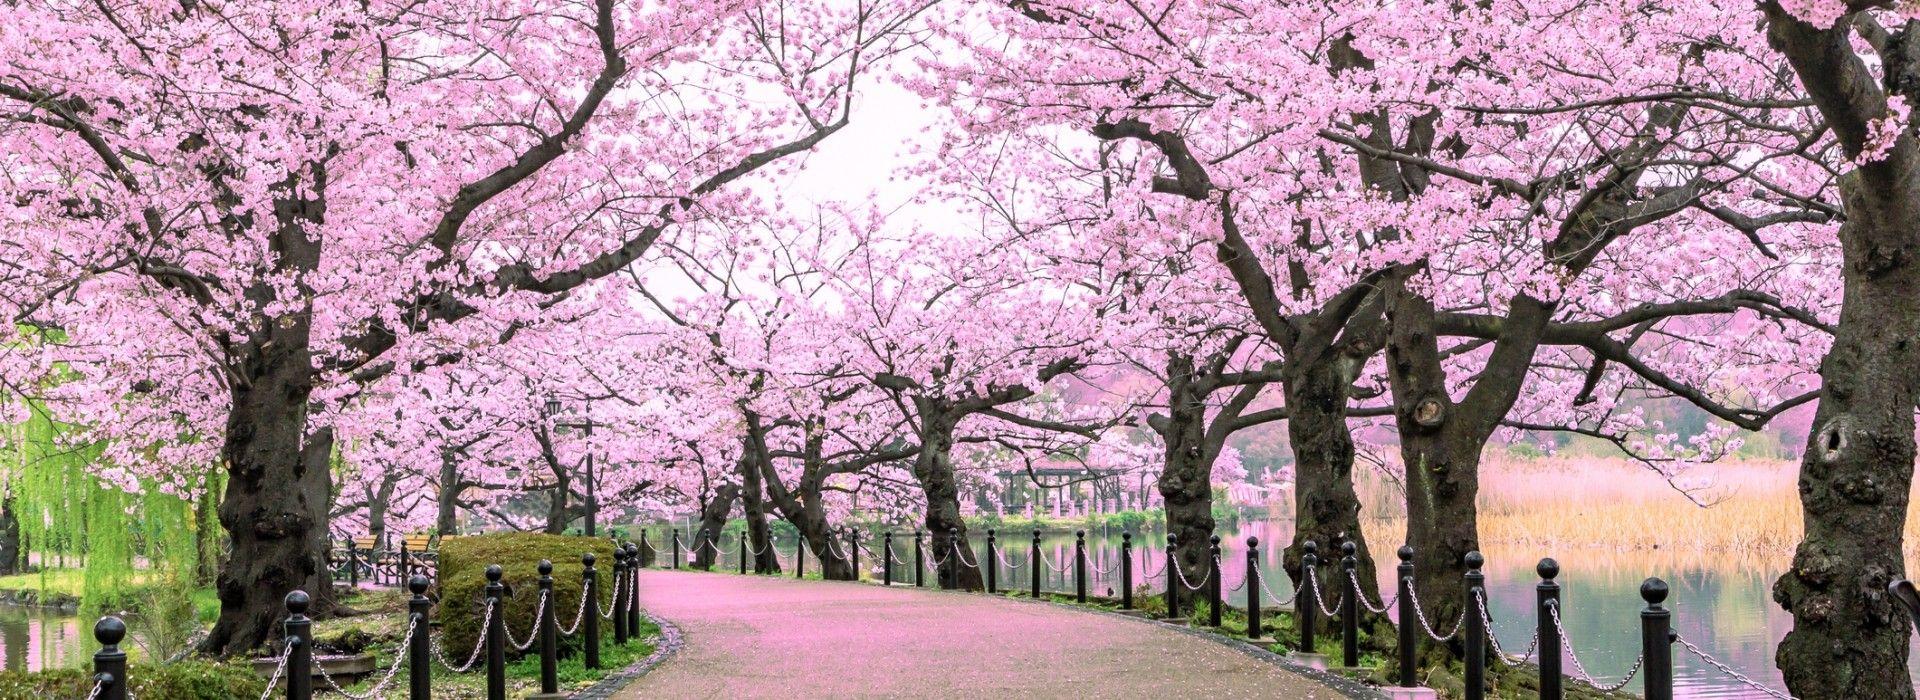 Cherry Blossom Festival tour and trips